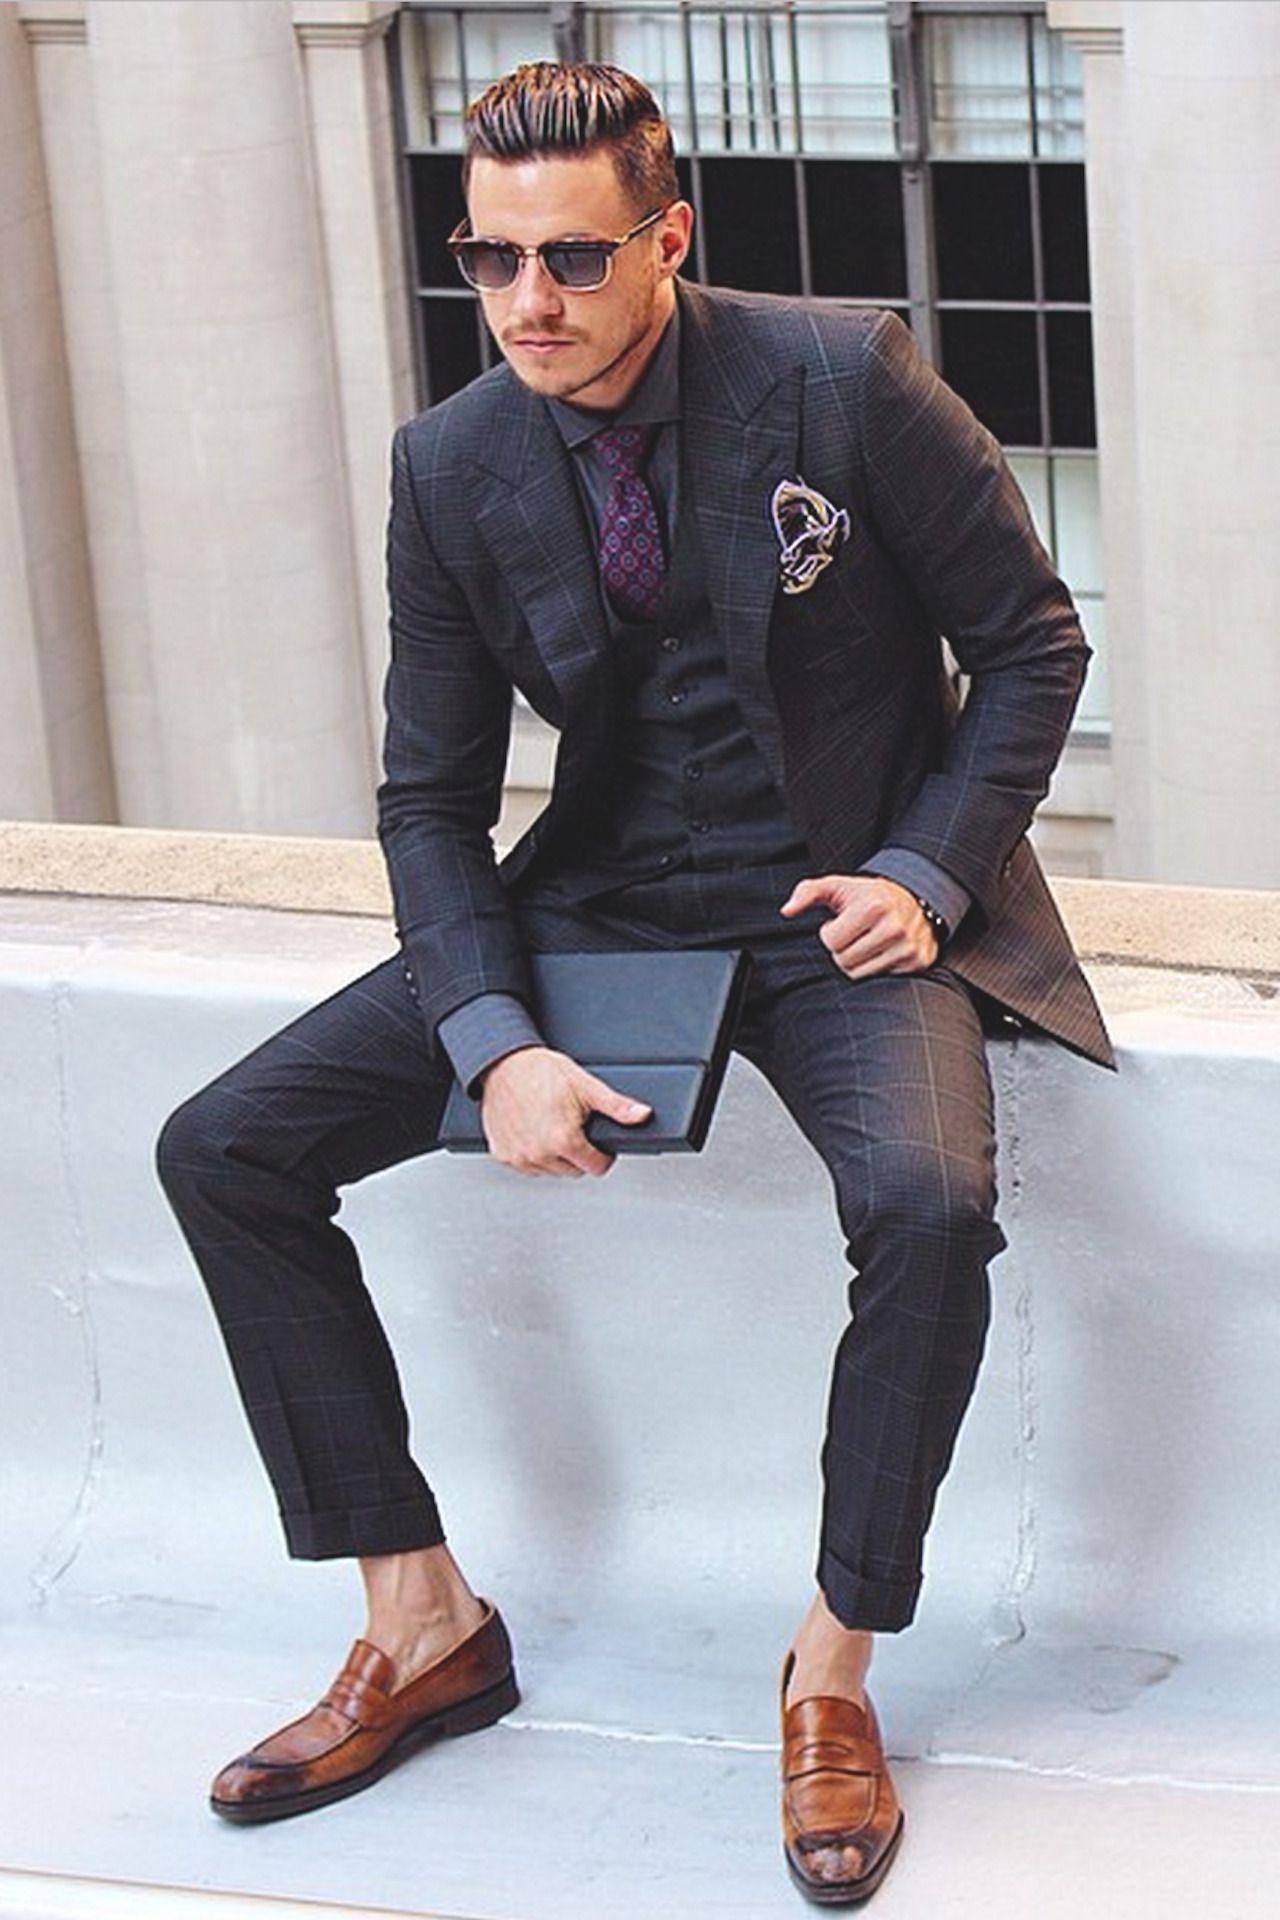 Yves Saint Laurent - Fashion Designer 39